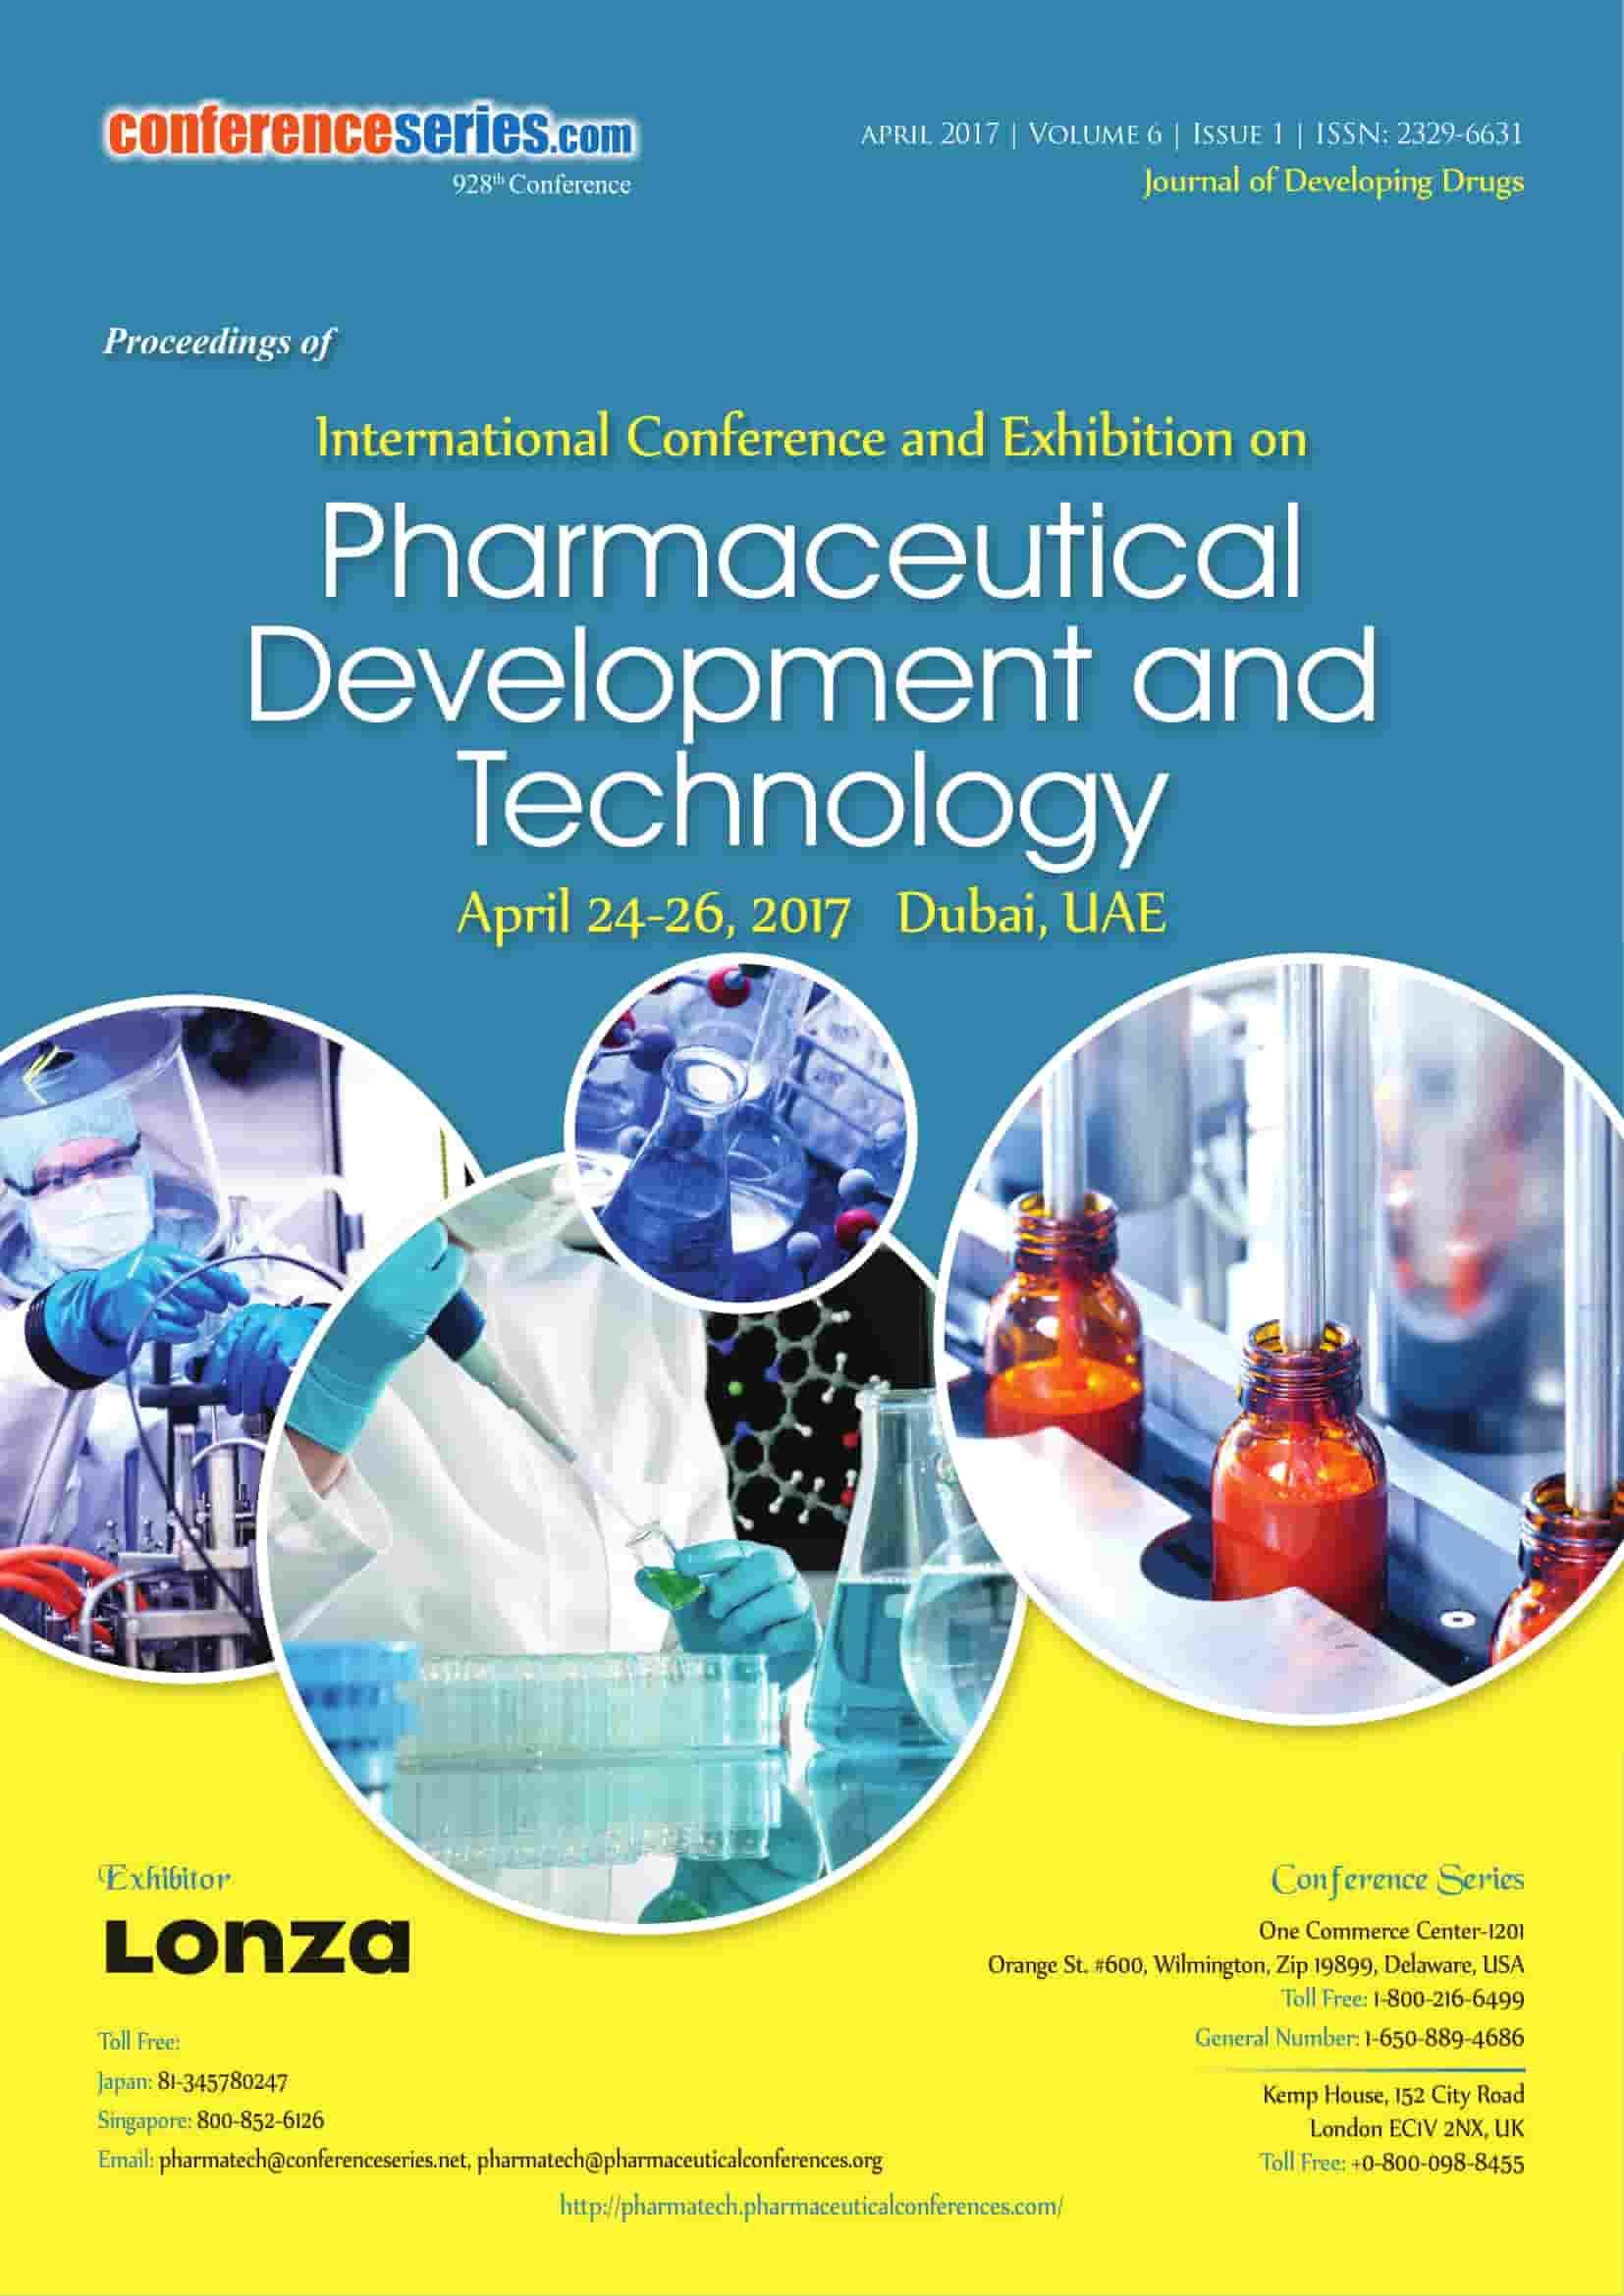 Pharmatech 2017